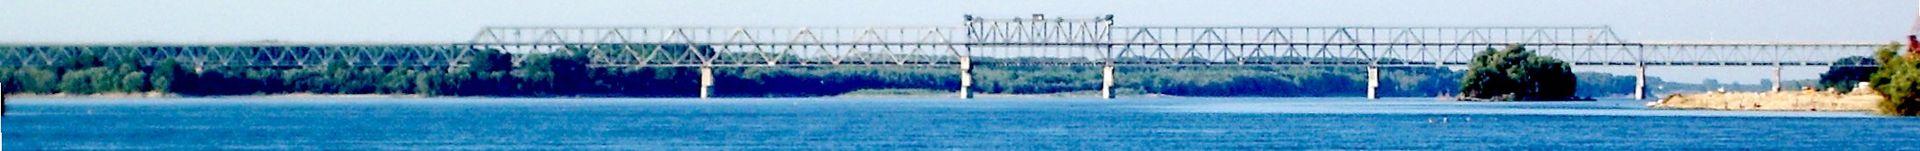 File:Rousse-Giurgiu Bridge.jpg